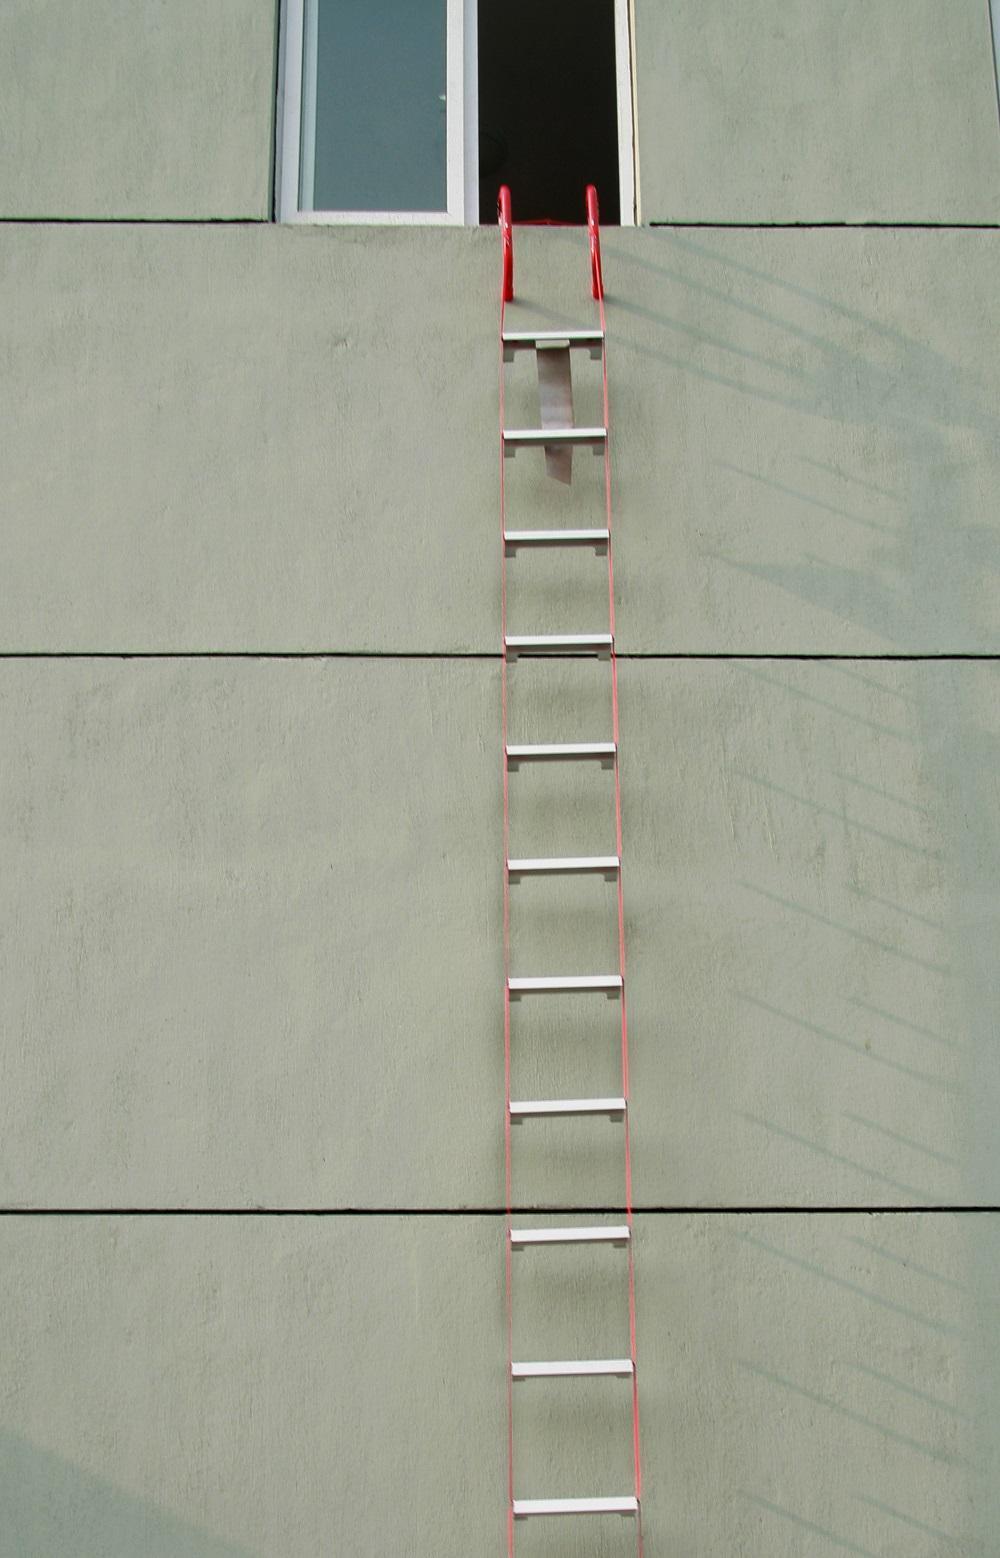 ETS-001 火灾逃生梯 2